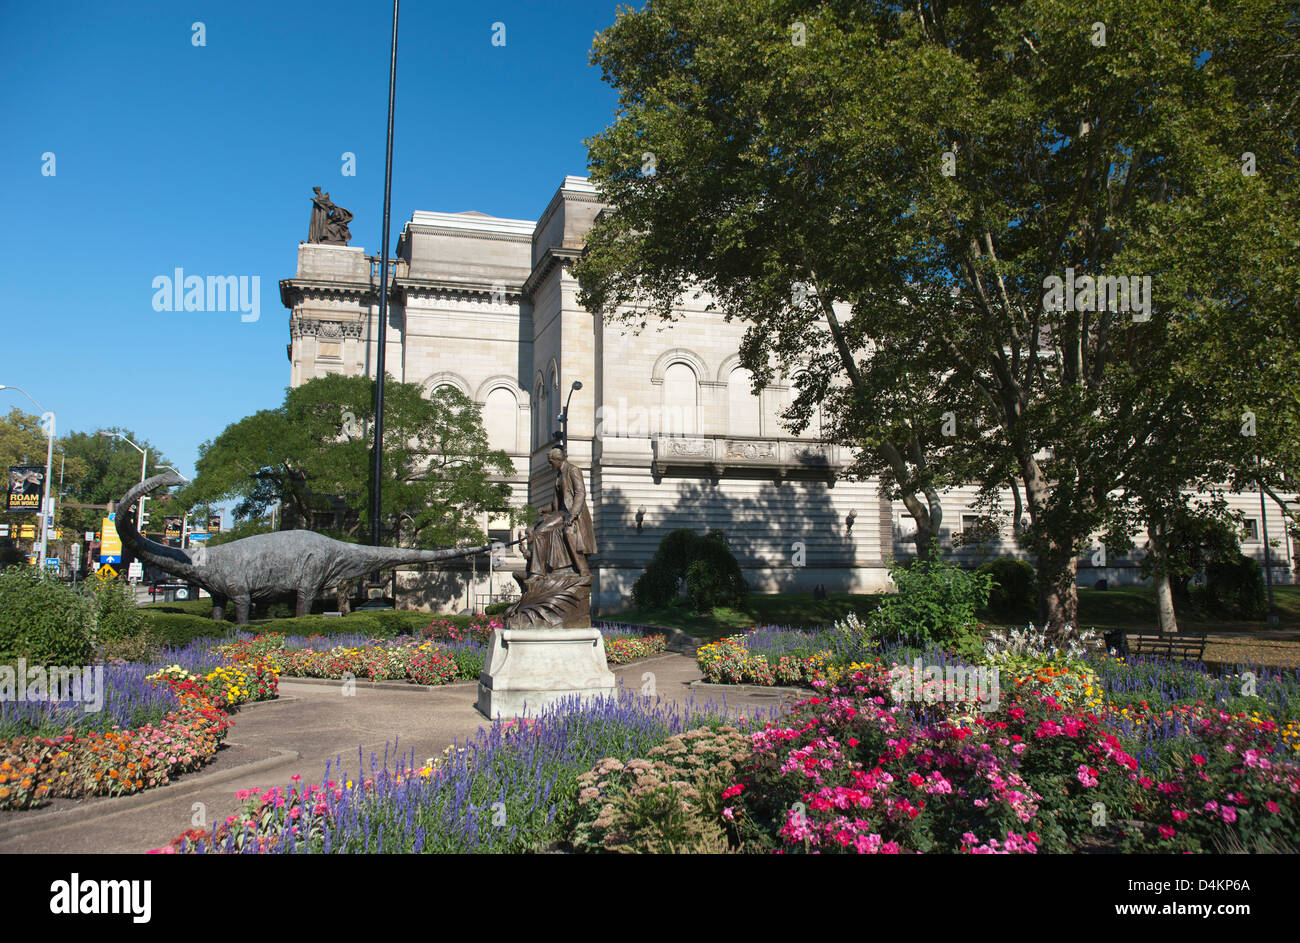 CARNEGIE MUSEUM OF NATURAL HISTORY (©LONGFELLOW ALDEN & HARLOW 1894) OAKLAND PITTSBURGH PENNSYLVANIA USA - Stock Image